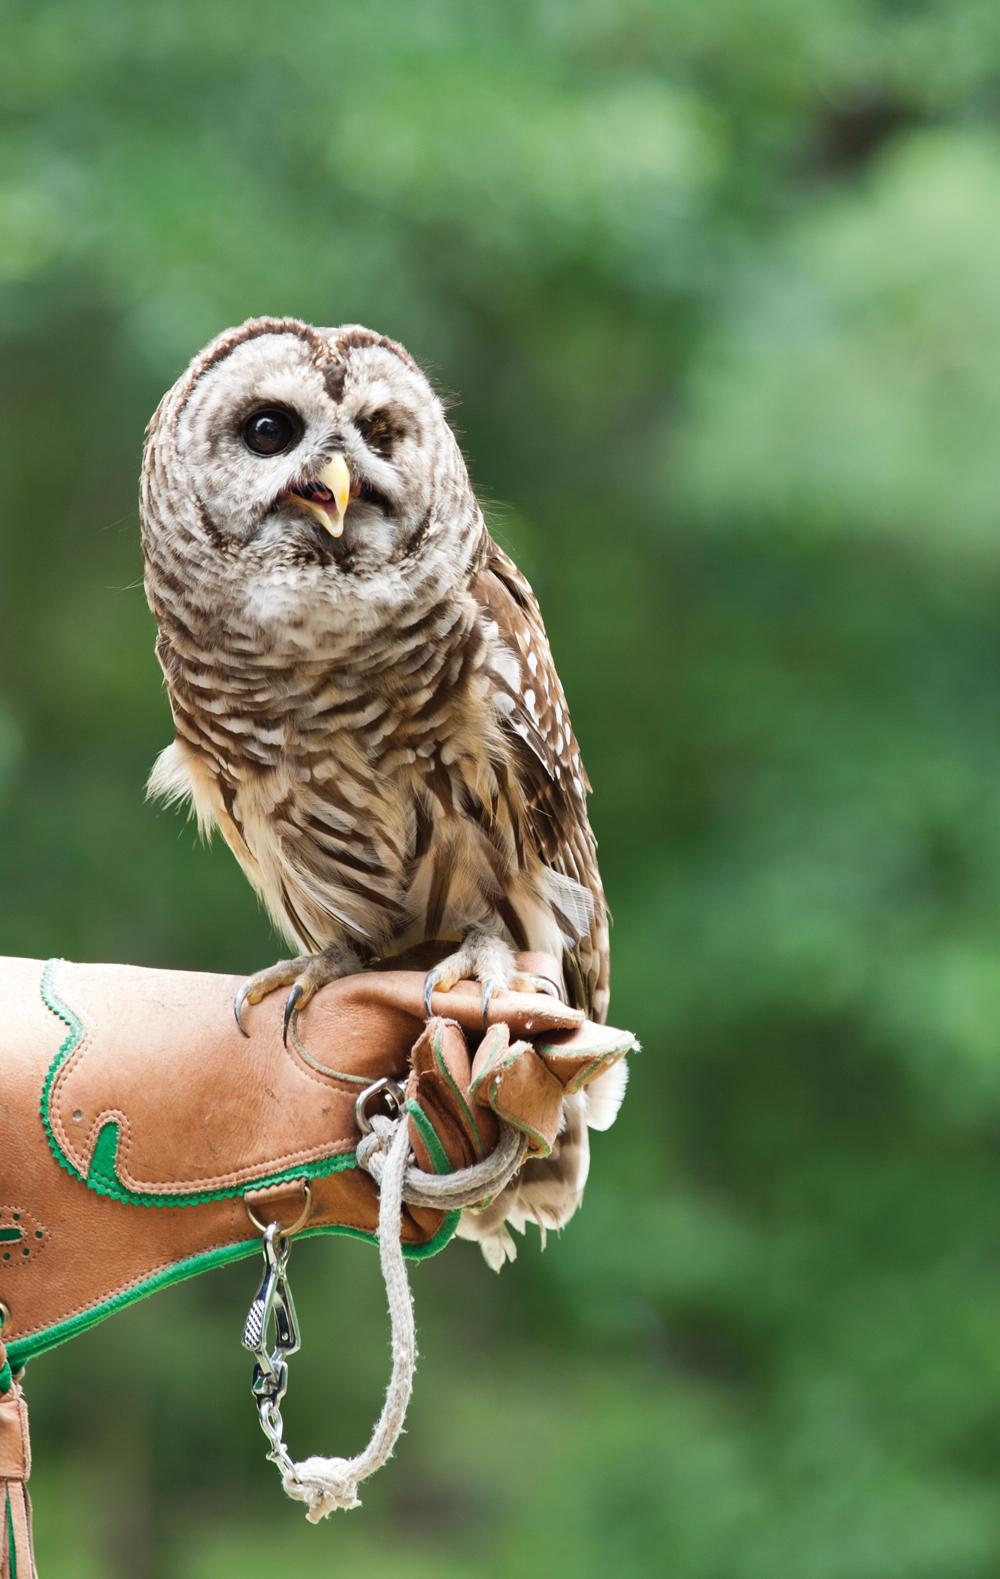 Chattahoochee Owl